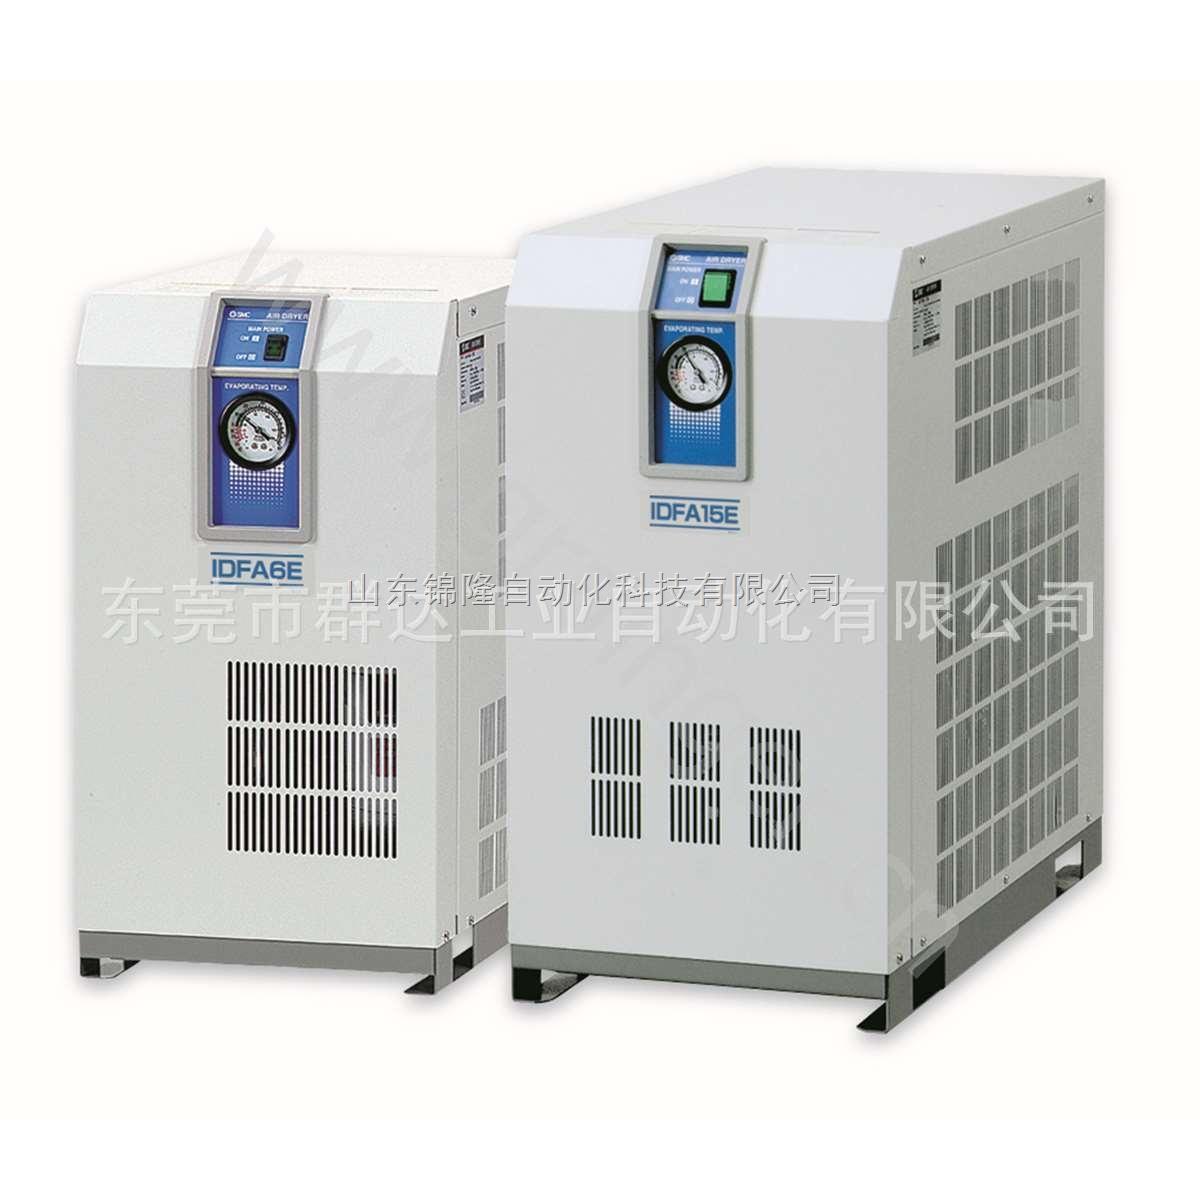 IDFA4E-23SMC干燥机现货